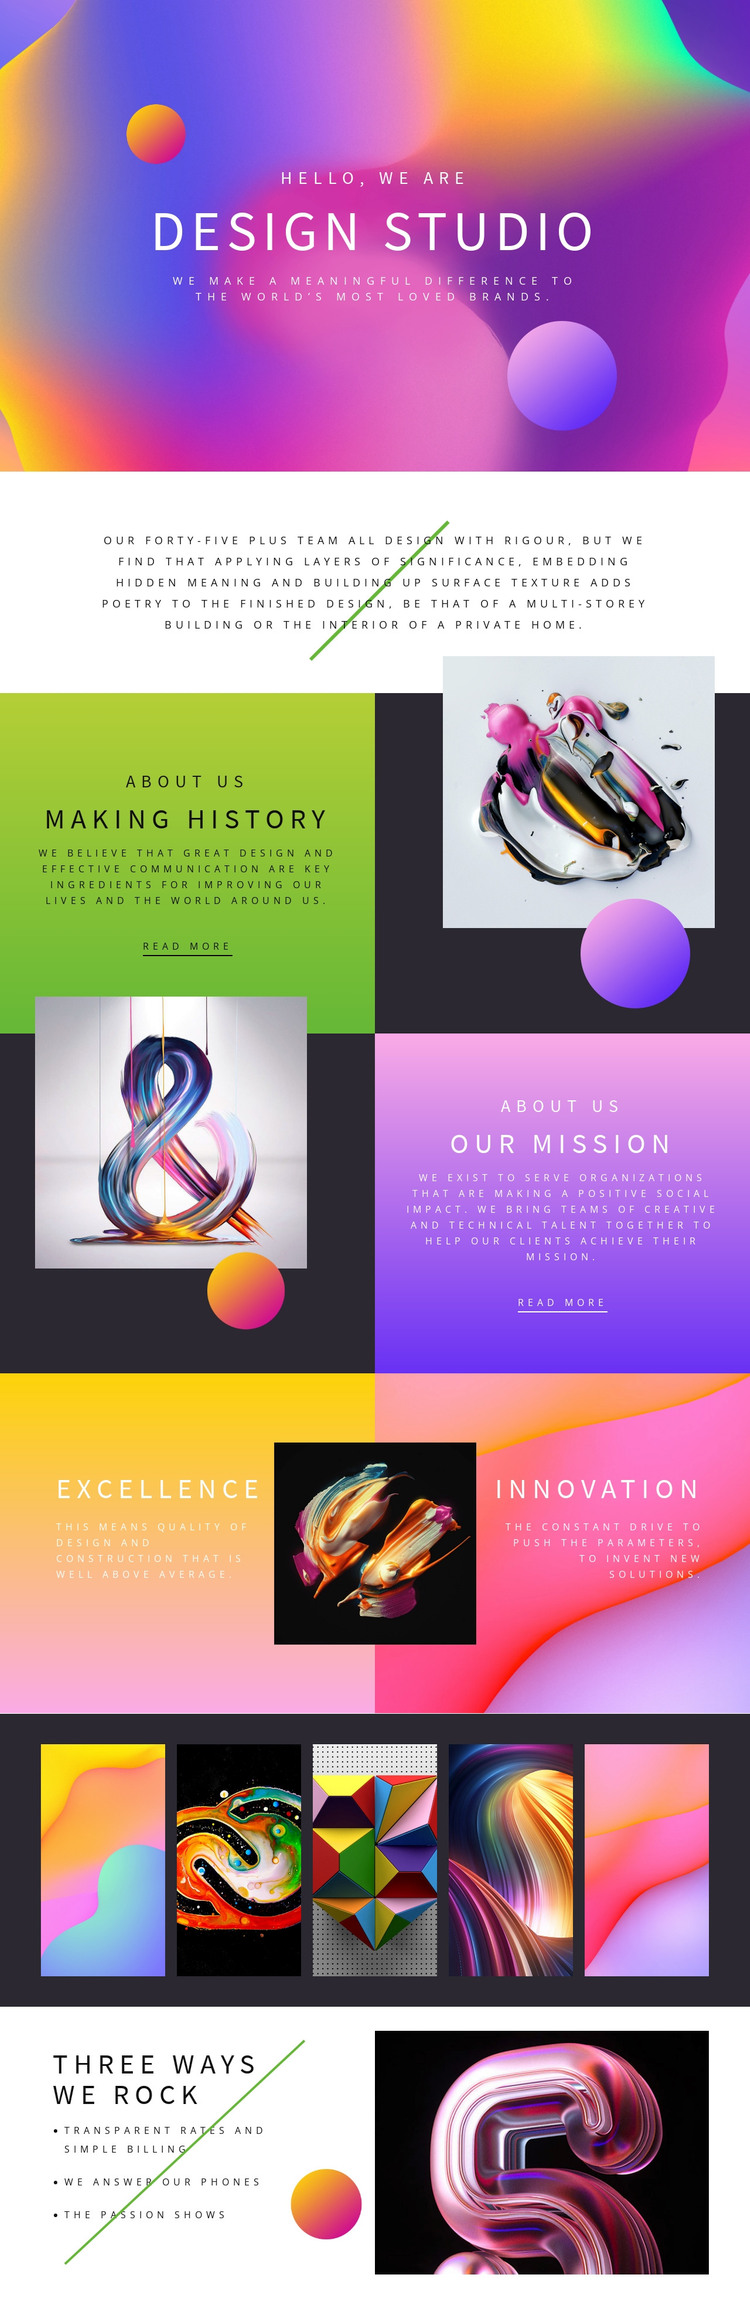 Progressive design art Woocommerce Theme